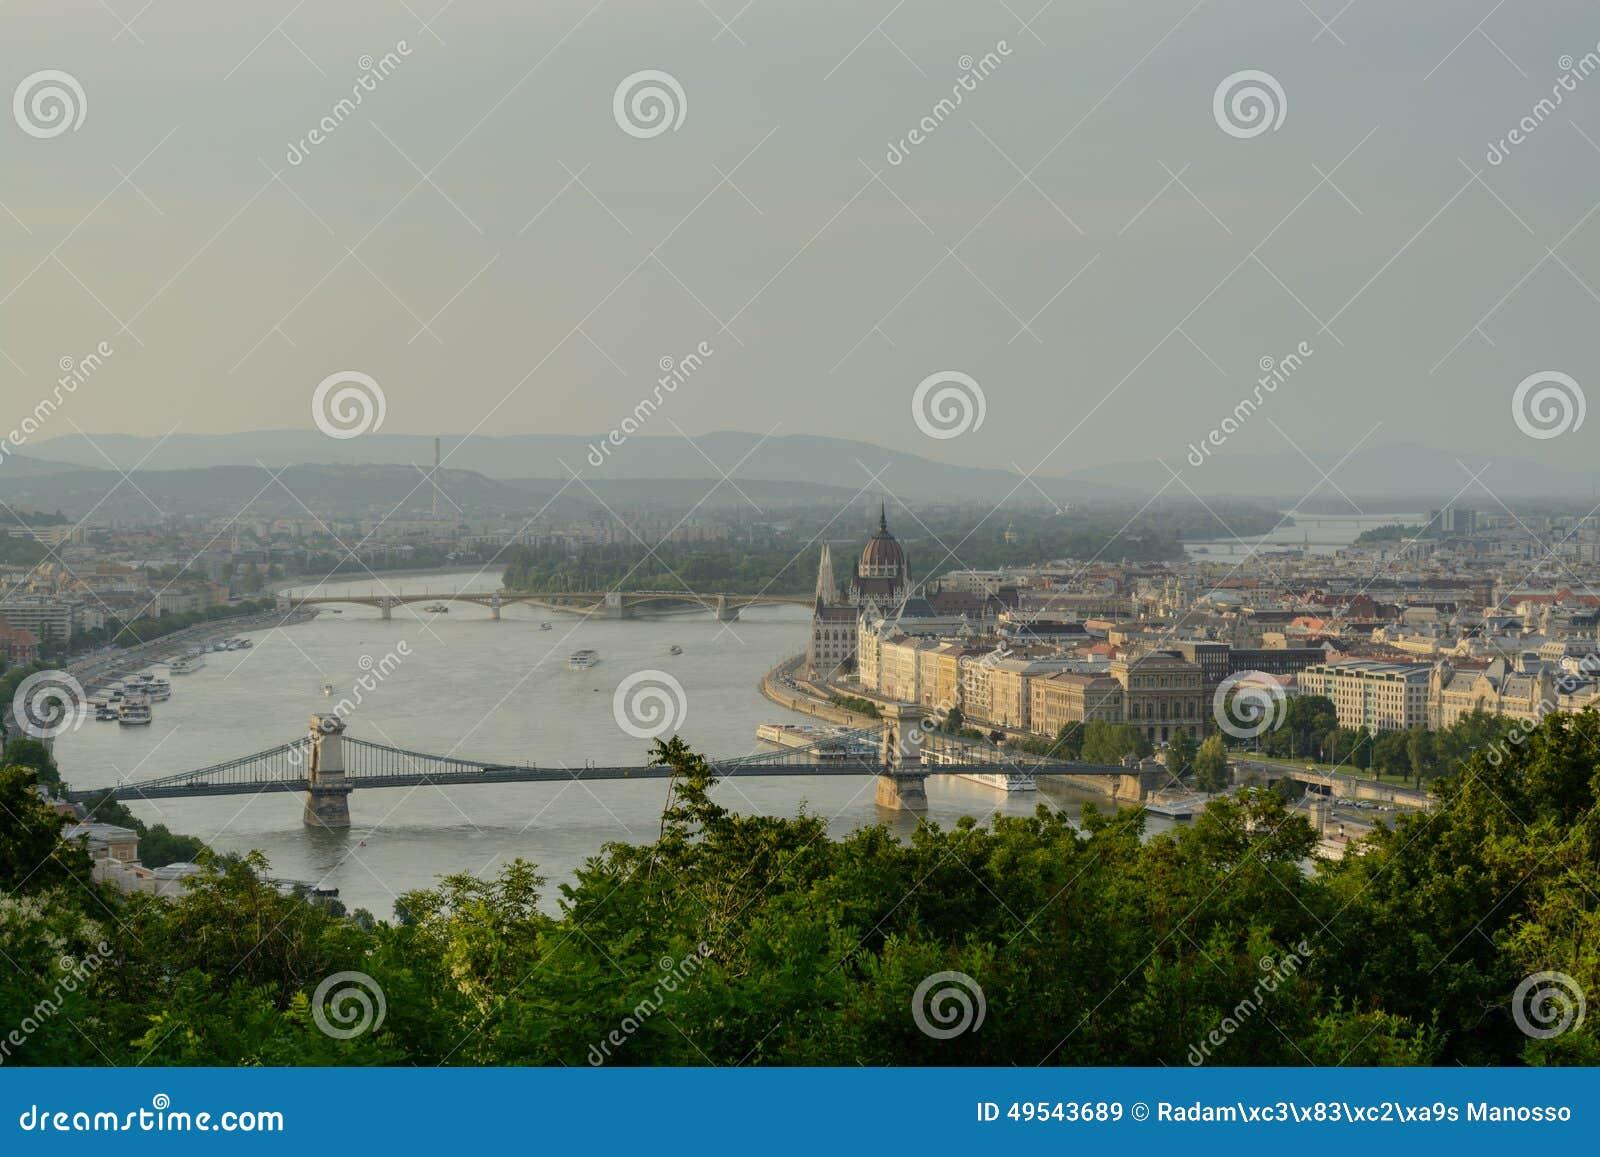 Danube river crossing Budapest